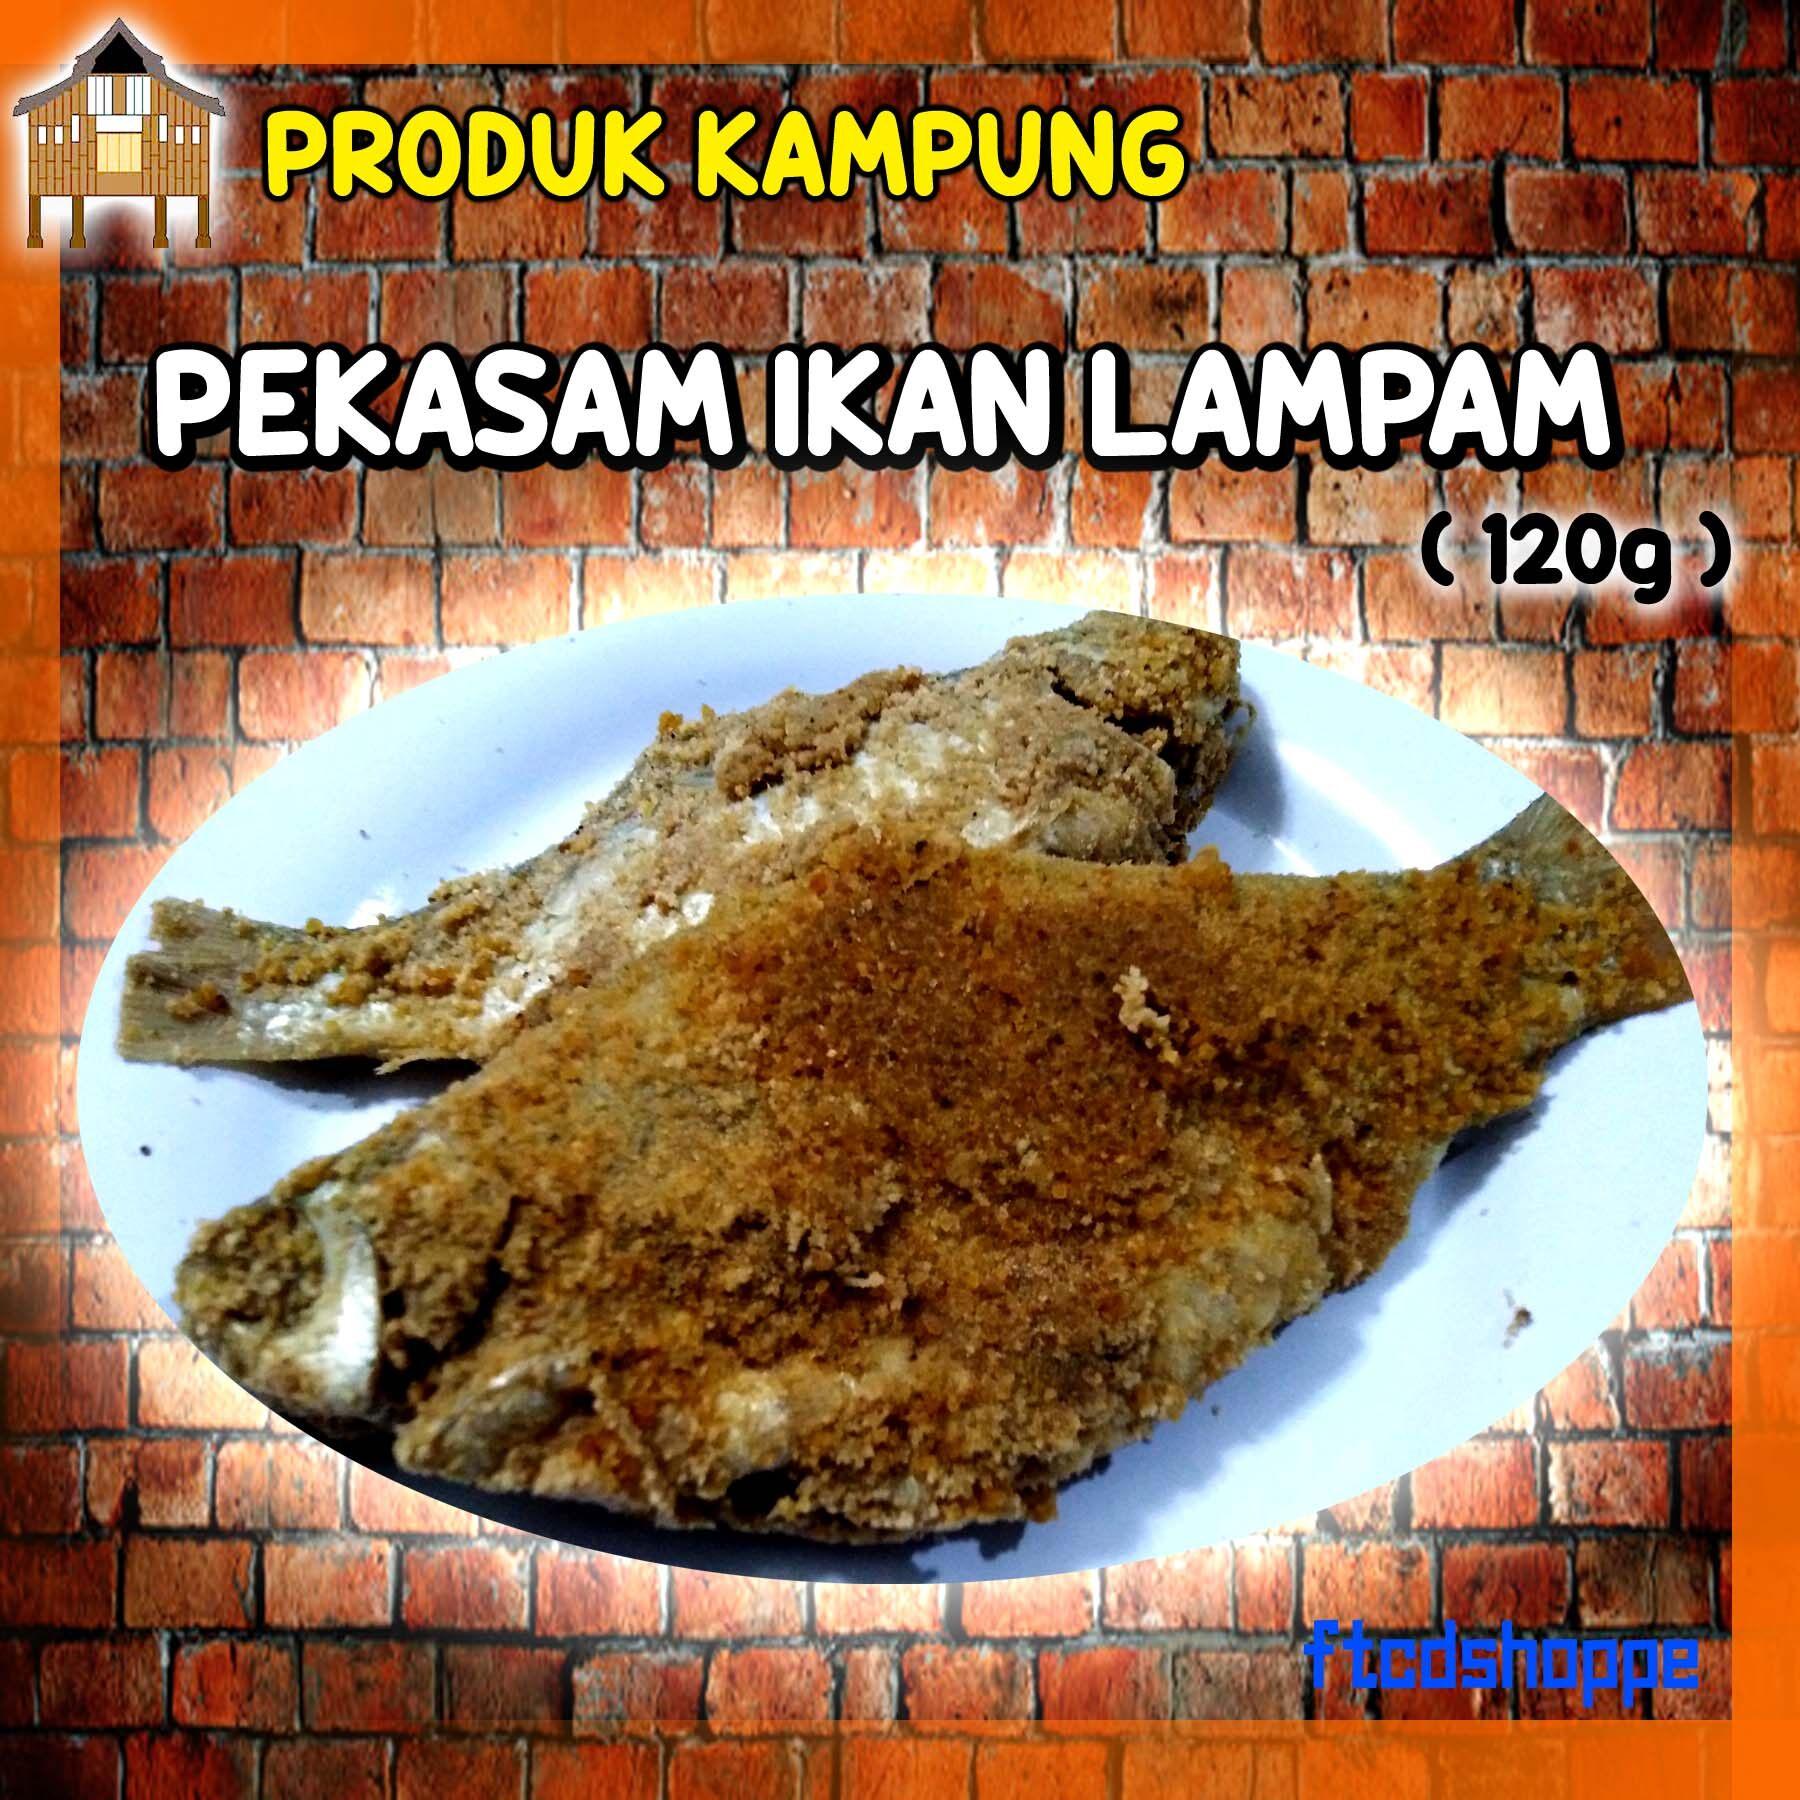 PRODUK KAMPUNG - Pekasam Ikan Lampam ( 120g )